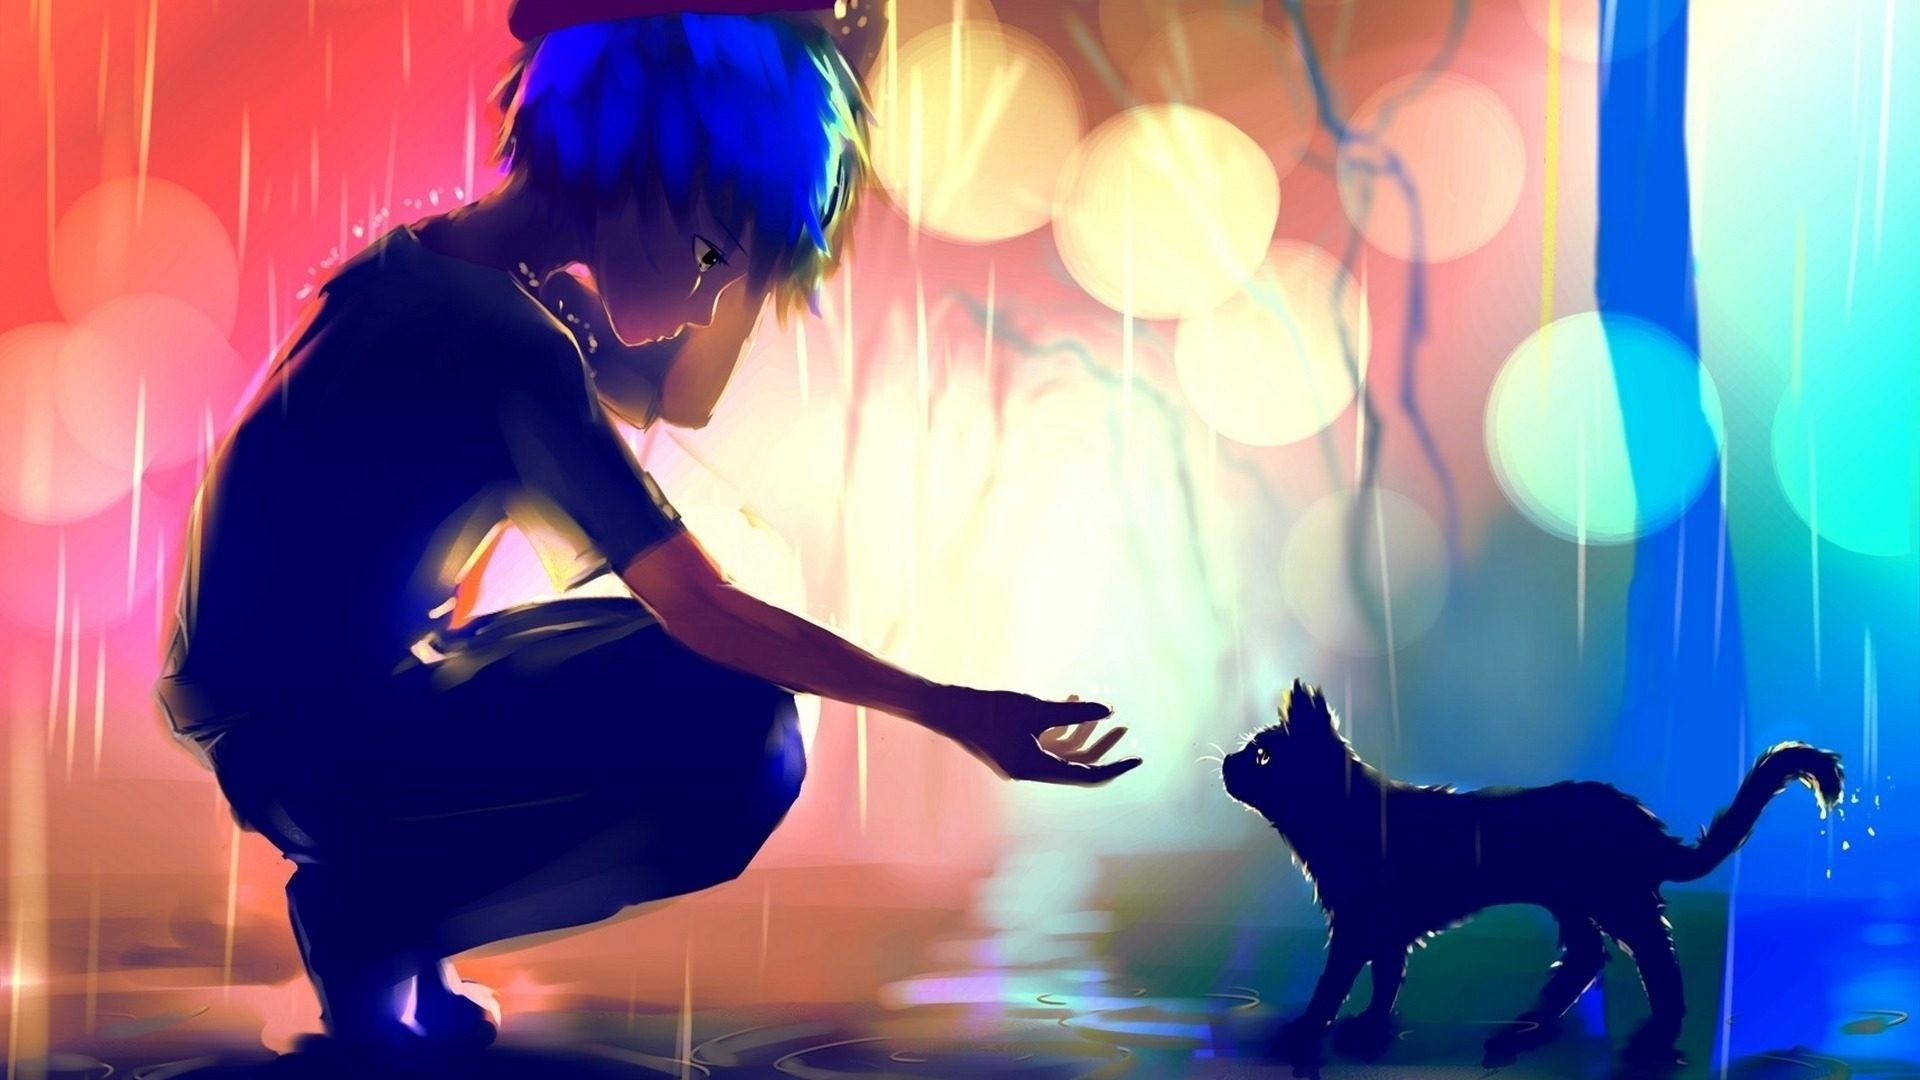 Anime Rain download wallpaper image